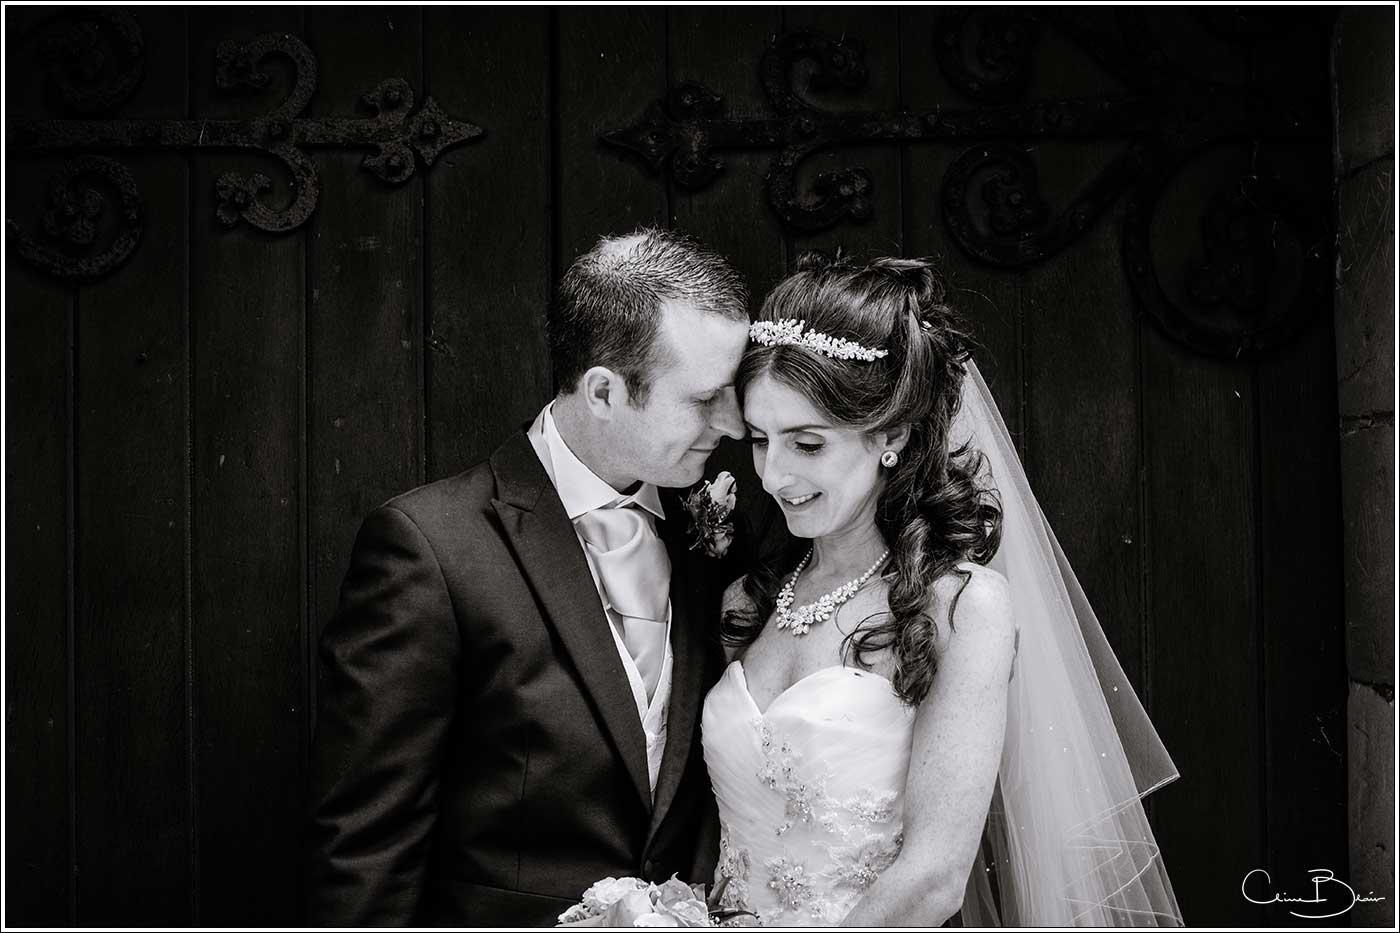 Tender moment between bride and groom: Bank House Wedding Photographer Clive Blair Photography. Documentary Birmingham Wedding Photographer